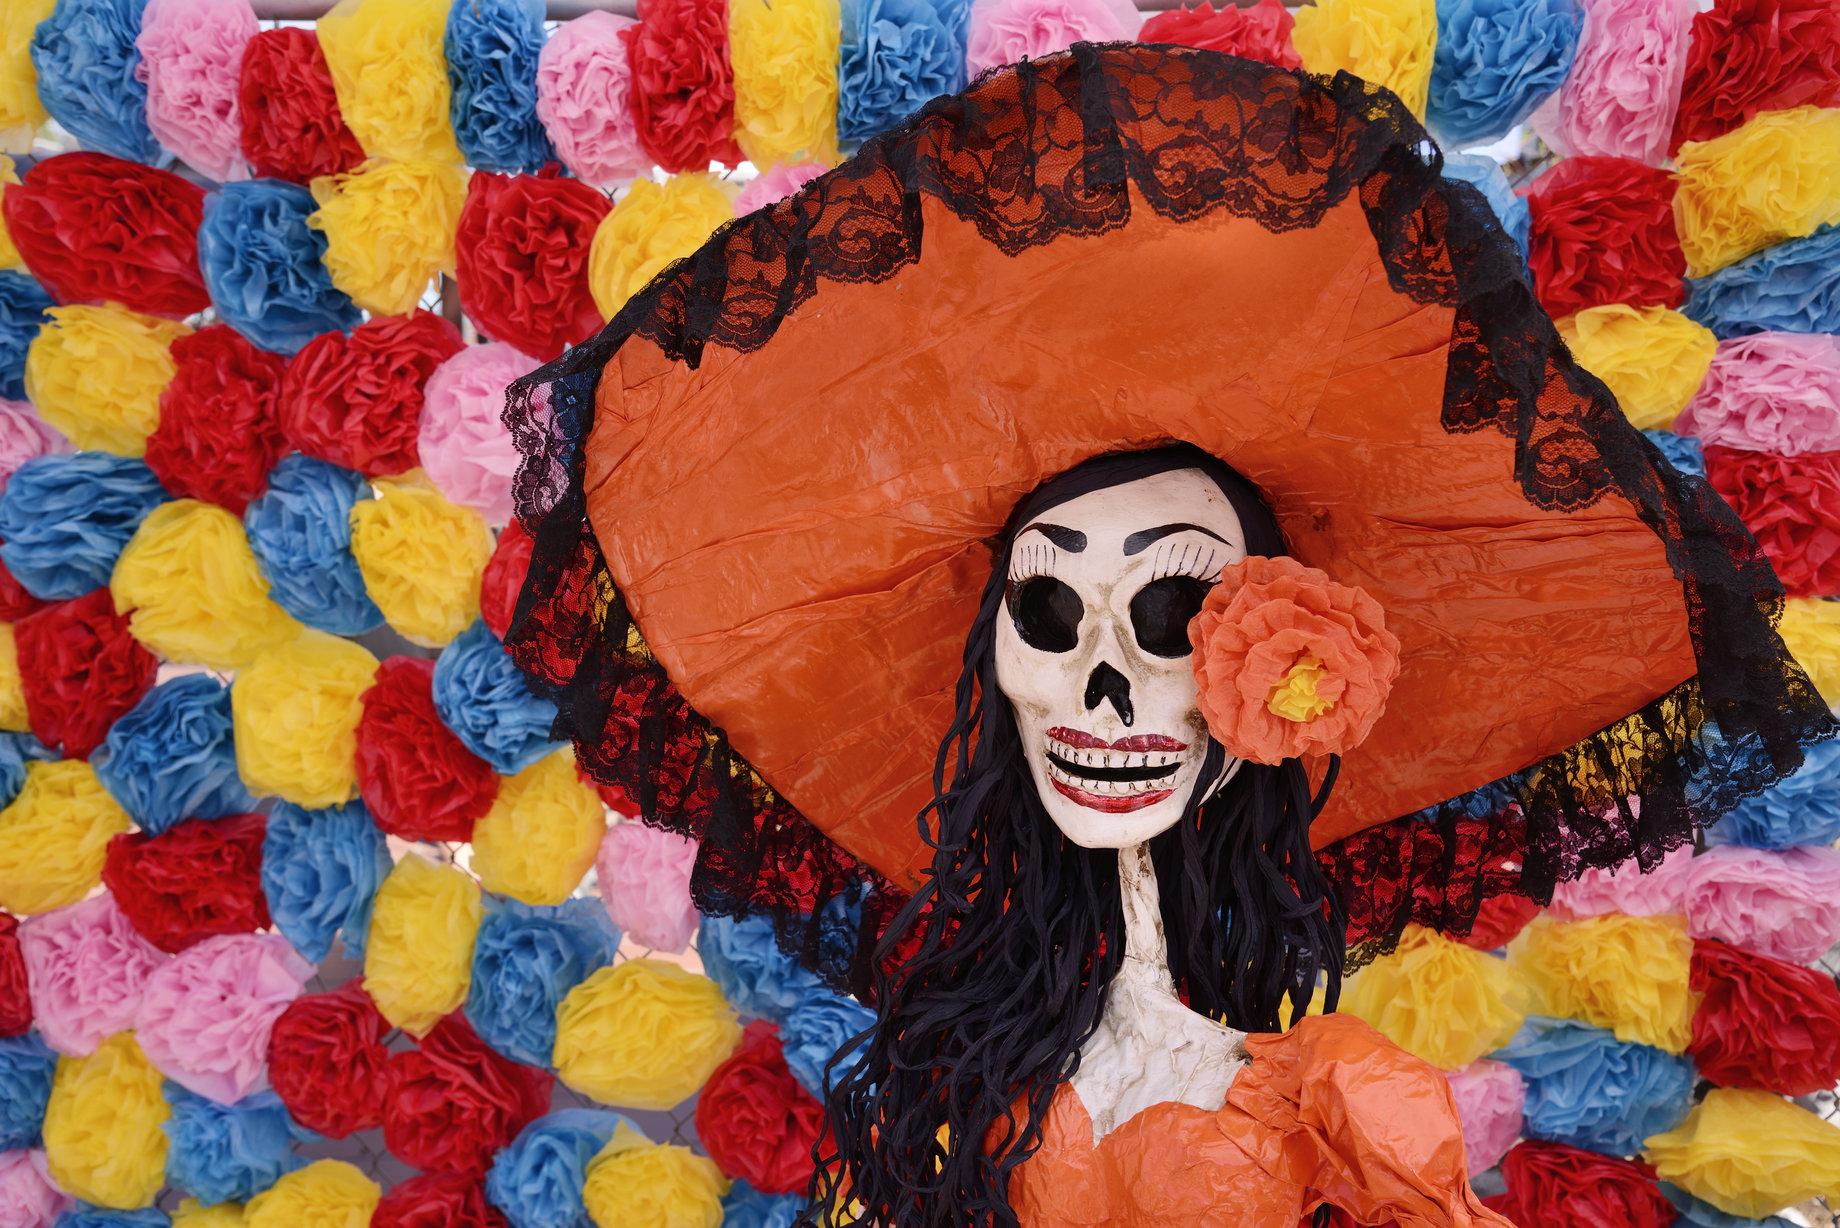 Traditional Mexican Catrina display